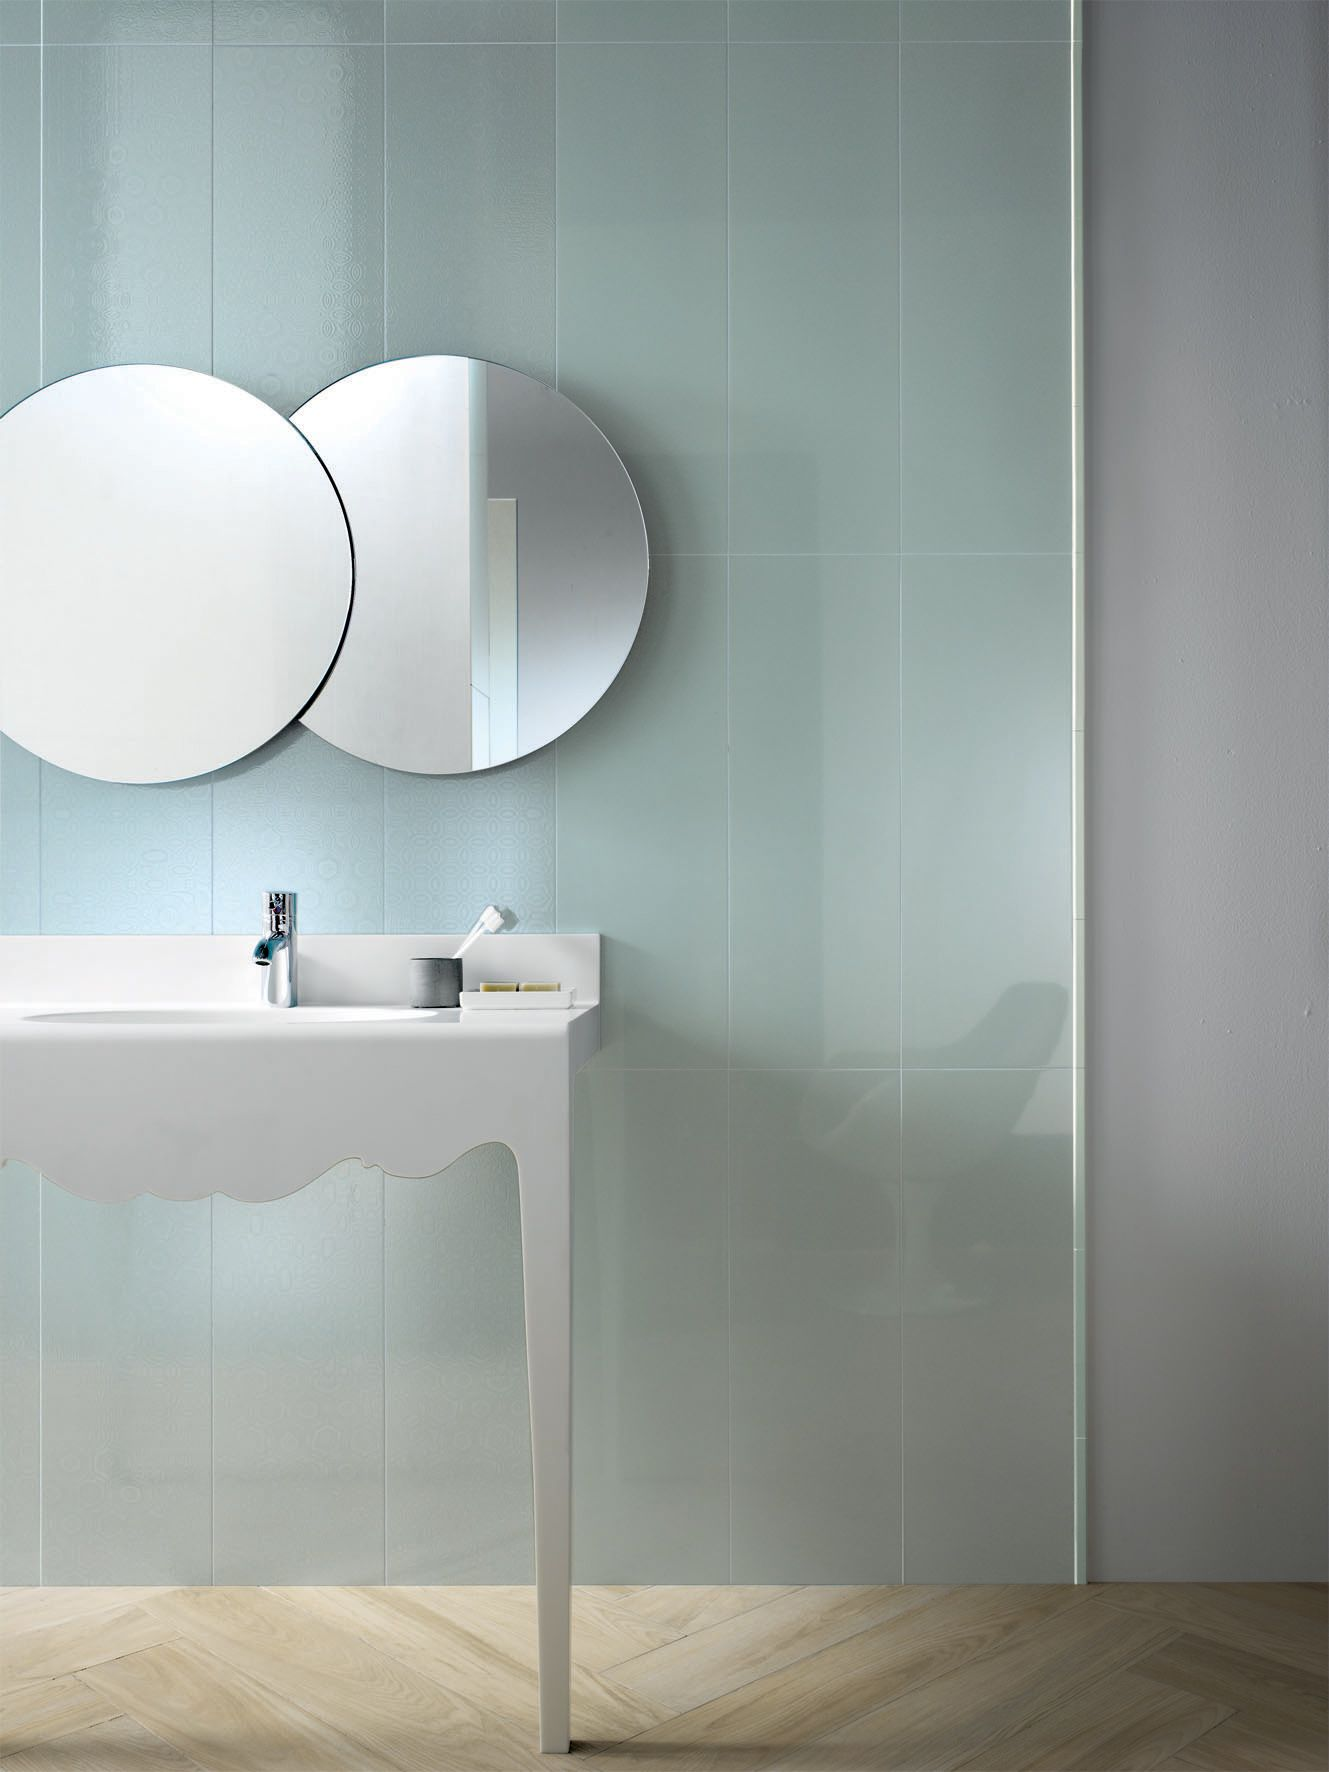 Ava Ceramica: Visia Mentha | Toilet & Bath Tile Ideas | Pinterest ...